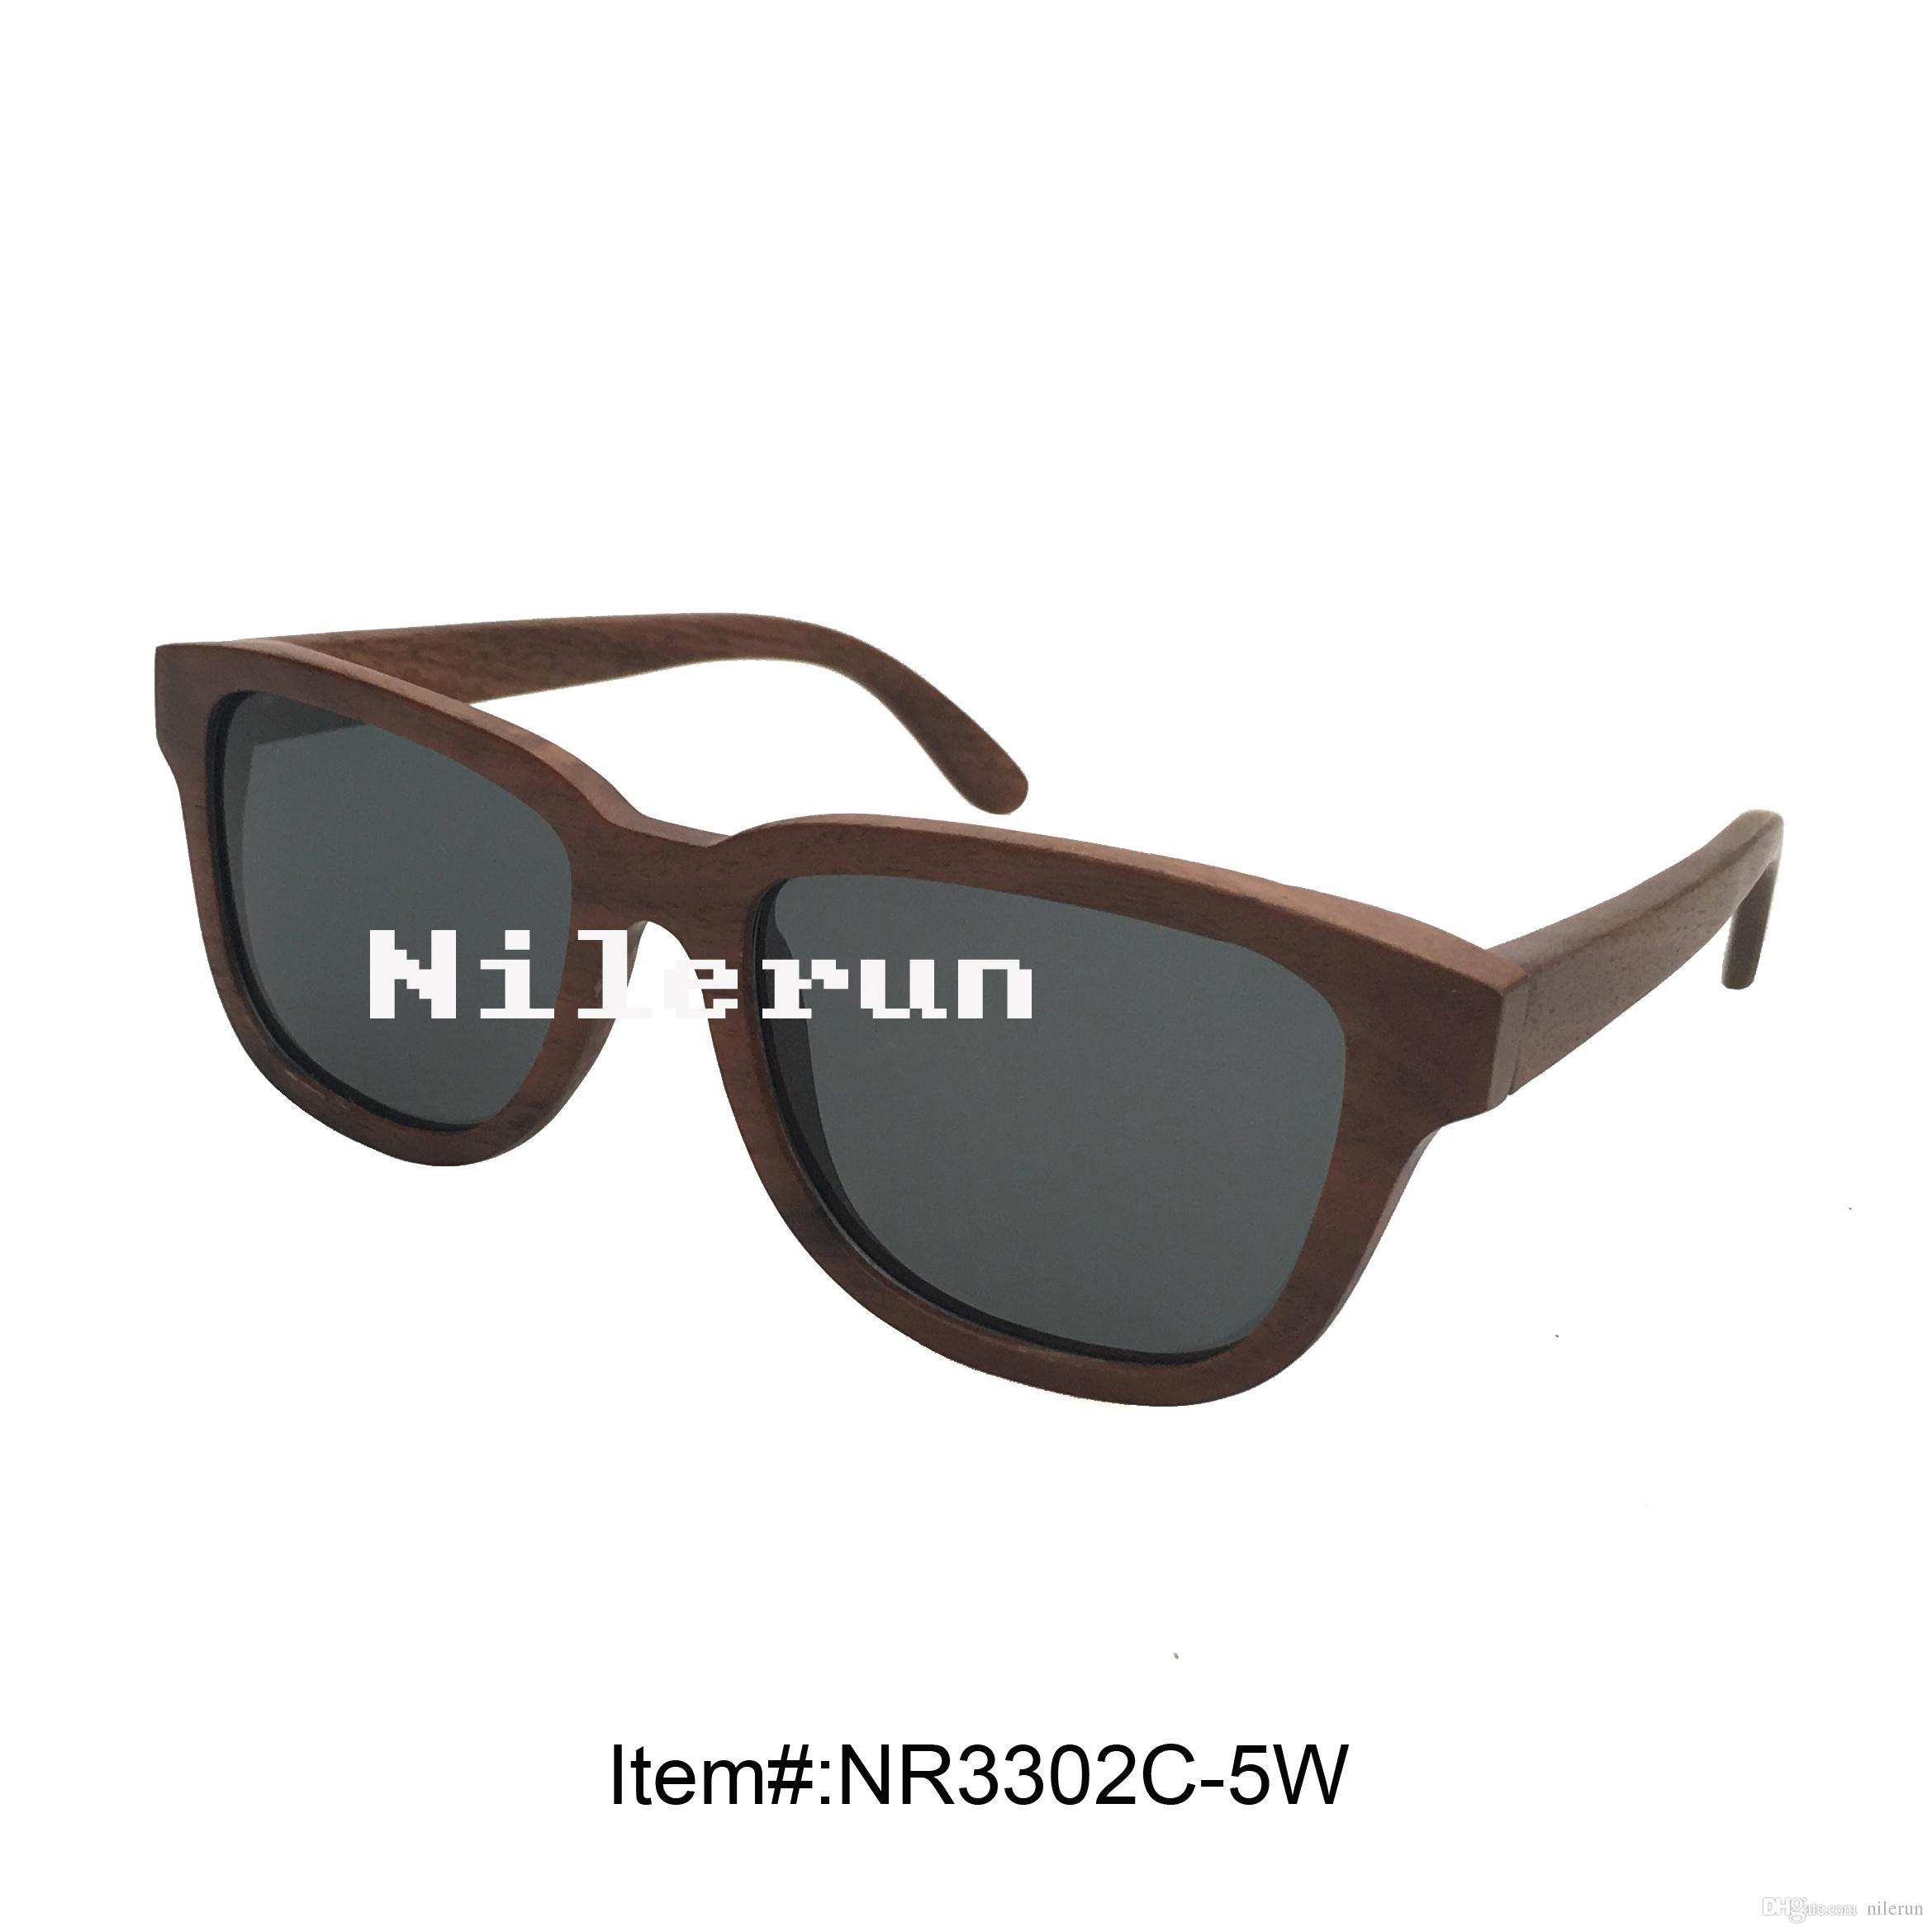 037dca84b5 Antique Walnut Wood Sunglasses Cheap Eyeglasses Online Sunglasses At Night  Lyrics From Nilerun